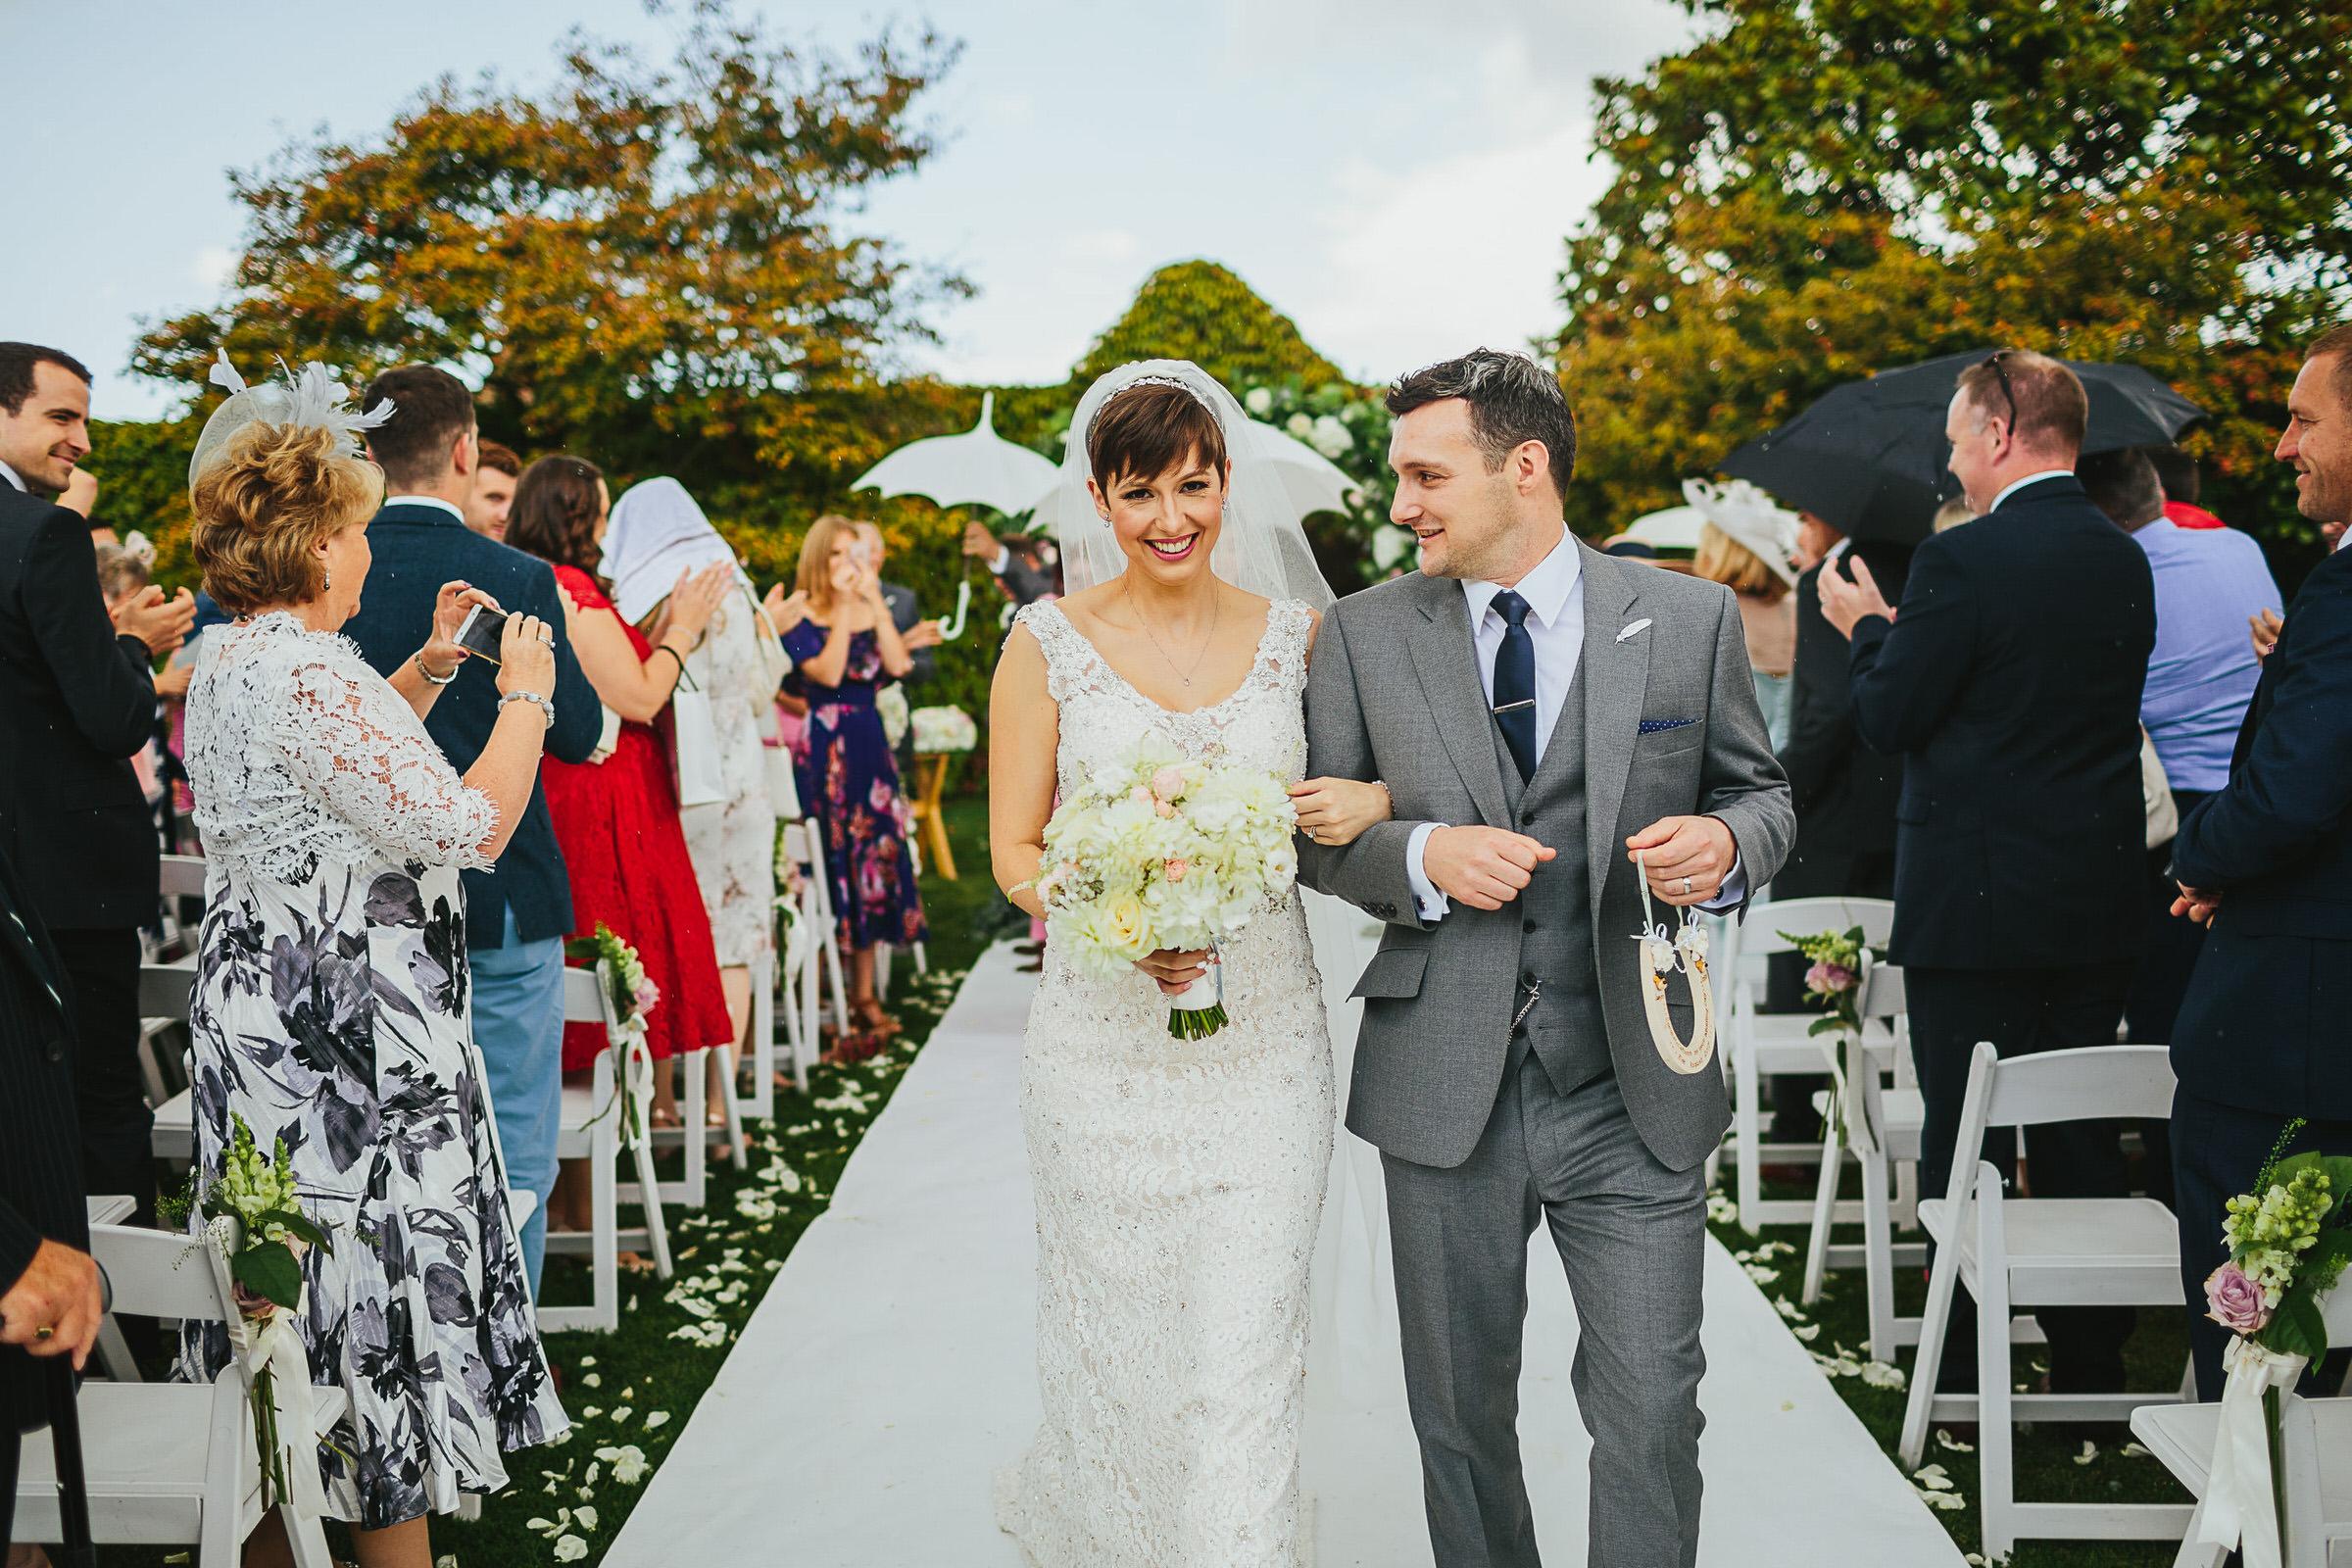 Notley Abbey outdoor wedding - Jess & James